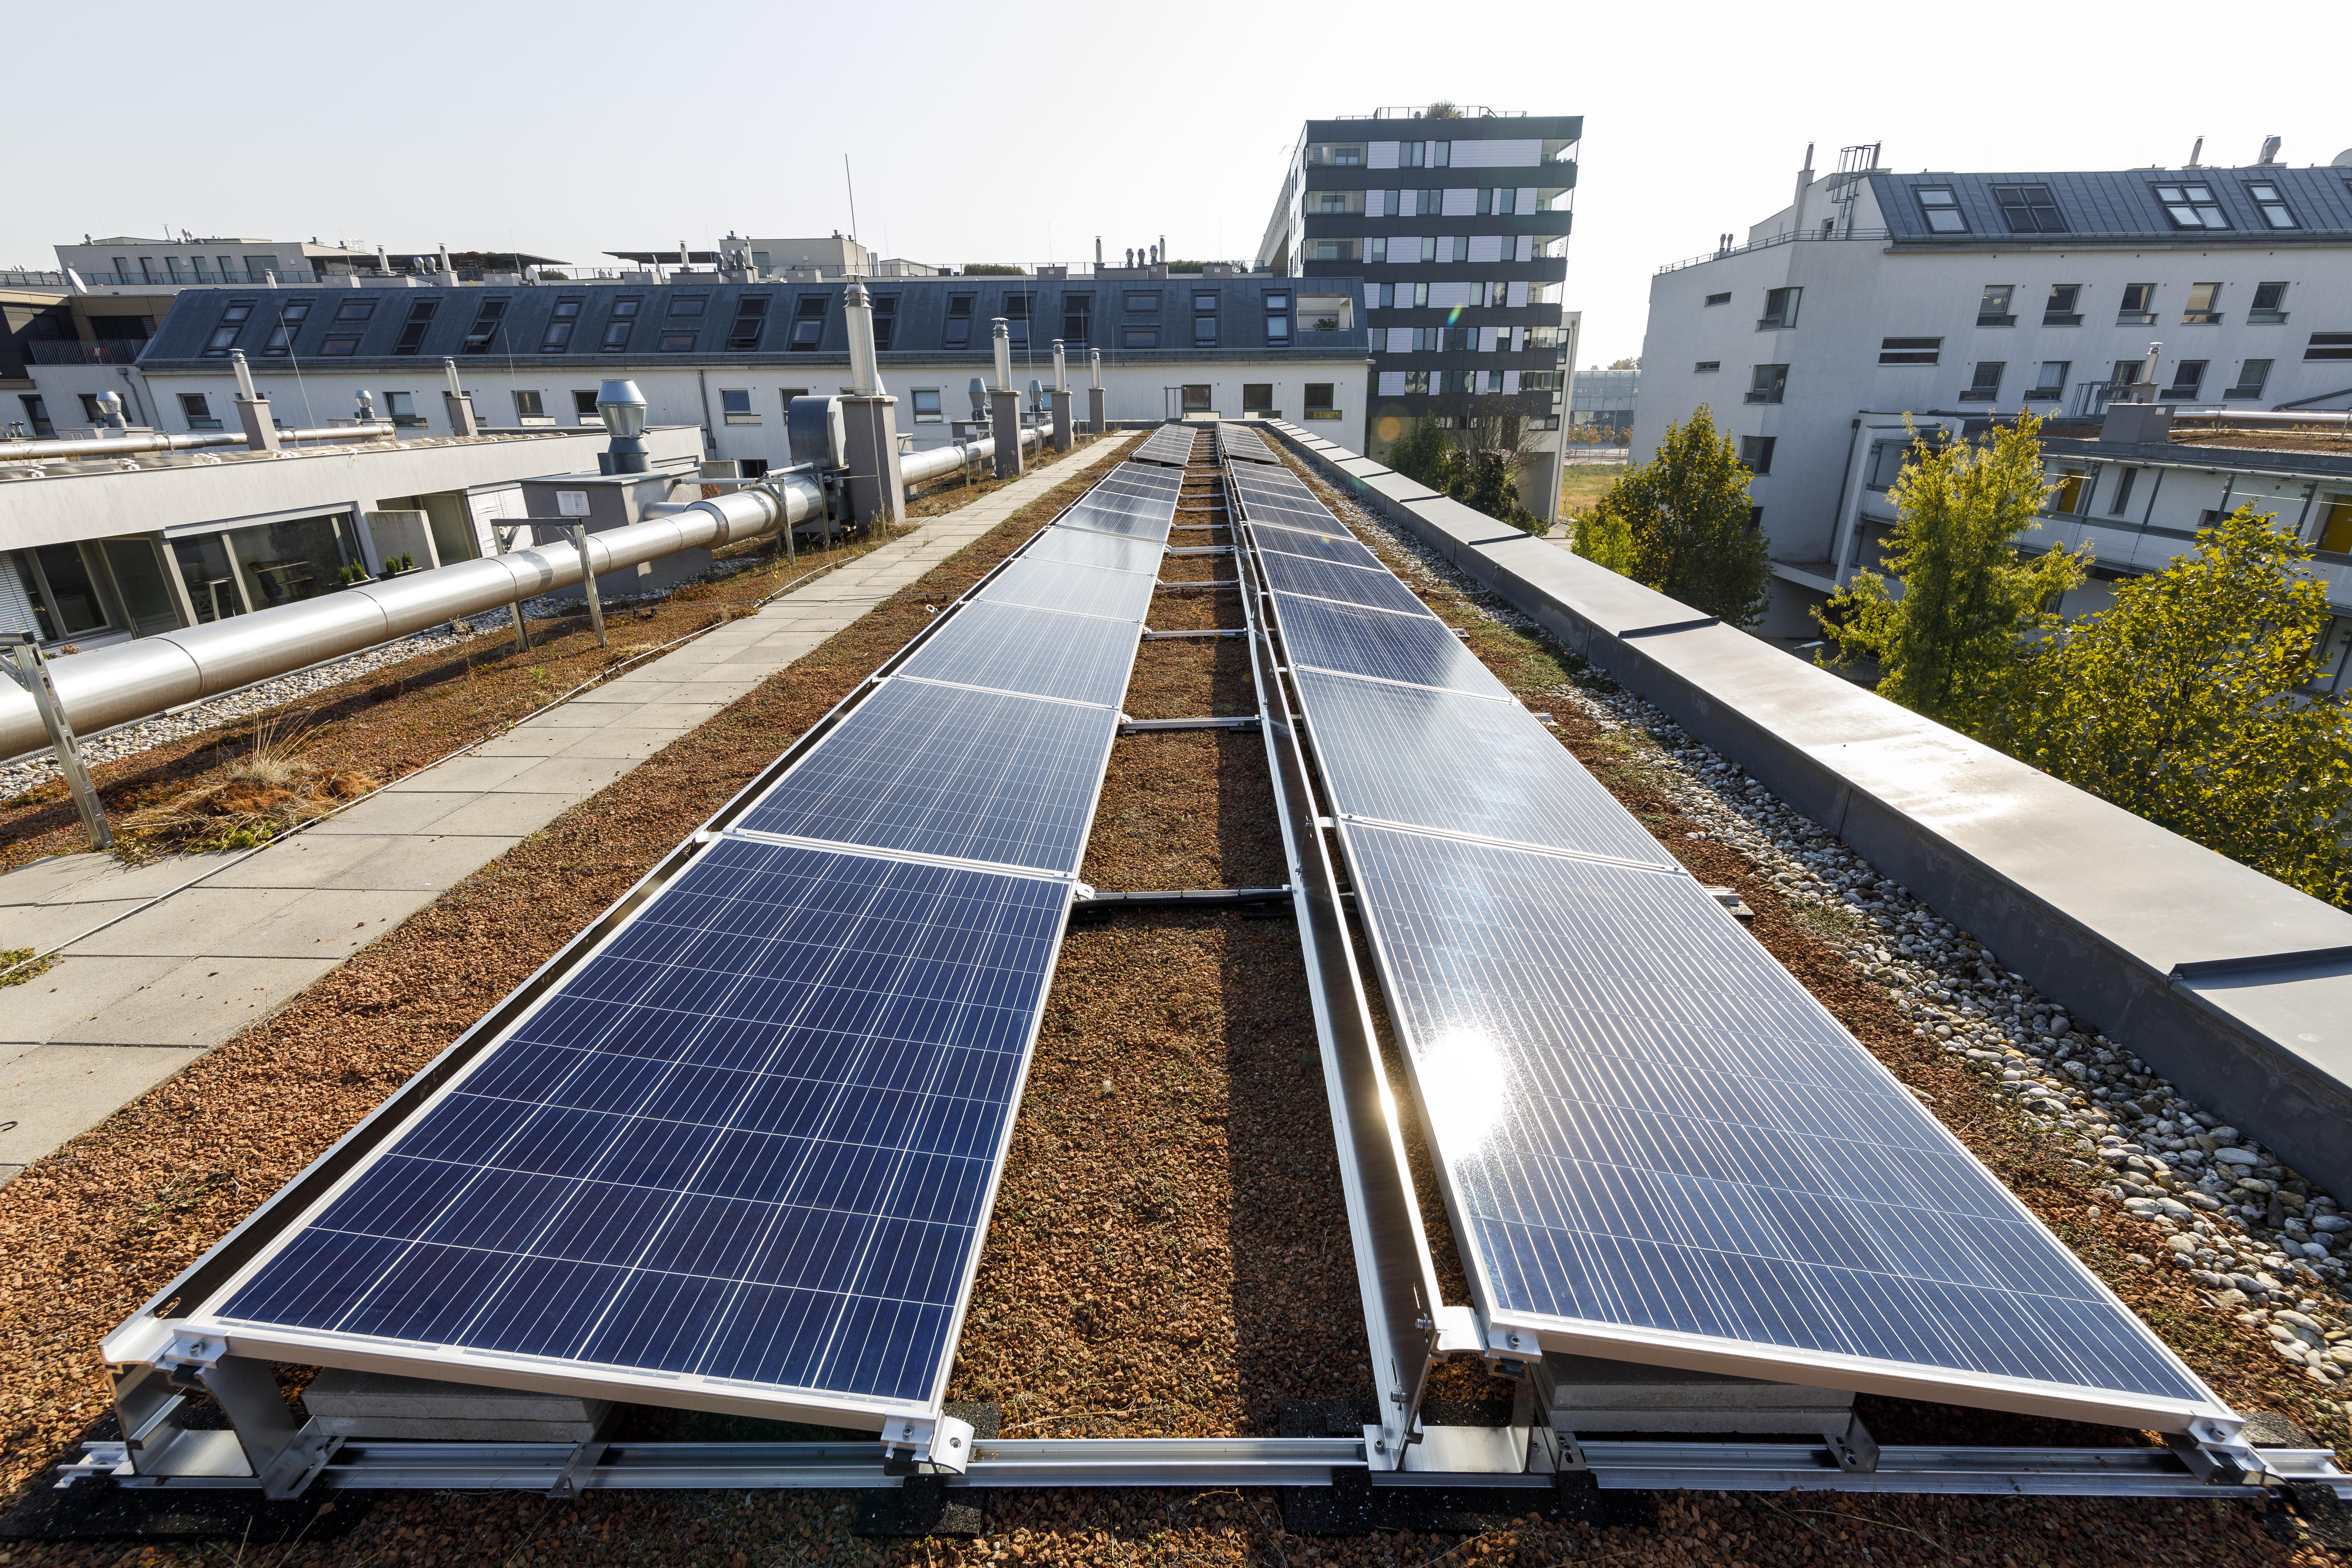 Montage der Photovoltaik-Anlage in 1220 Wien, Lavaterstraße; © Wien Energie/FOTObyHOFER/Christian Hofer